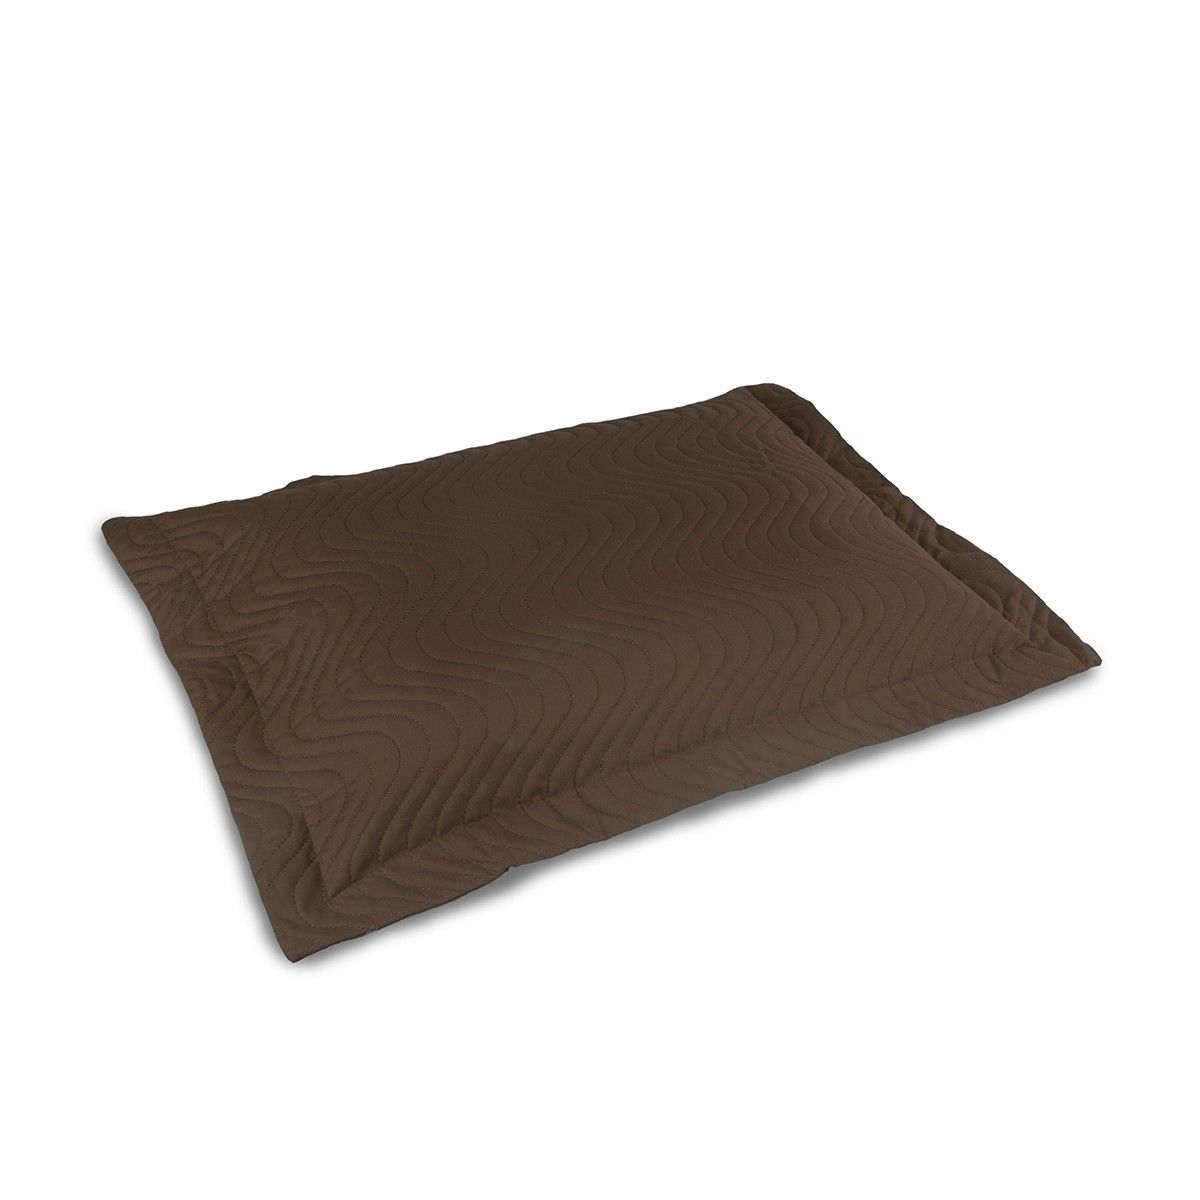 Porta Travesseiro Avulso Matelassado 180 Fios - Tabaco